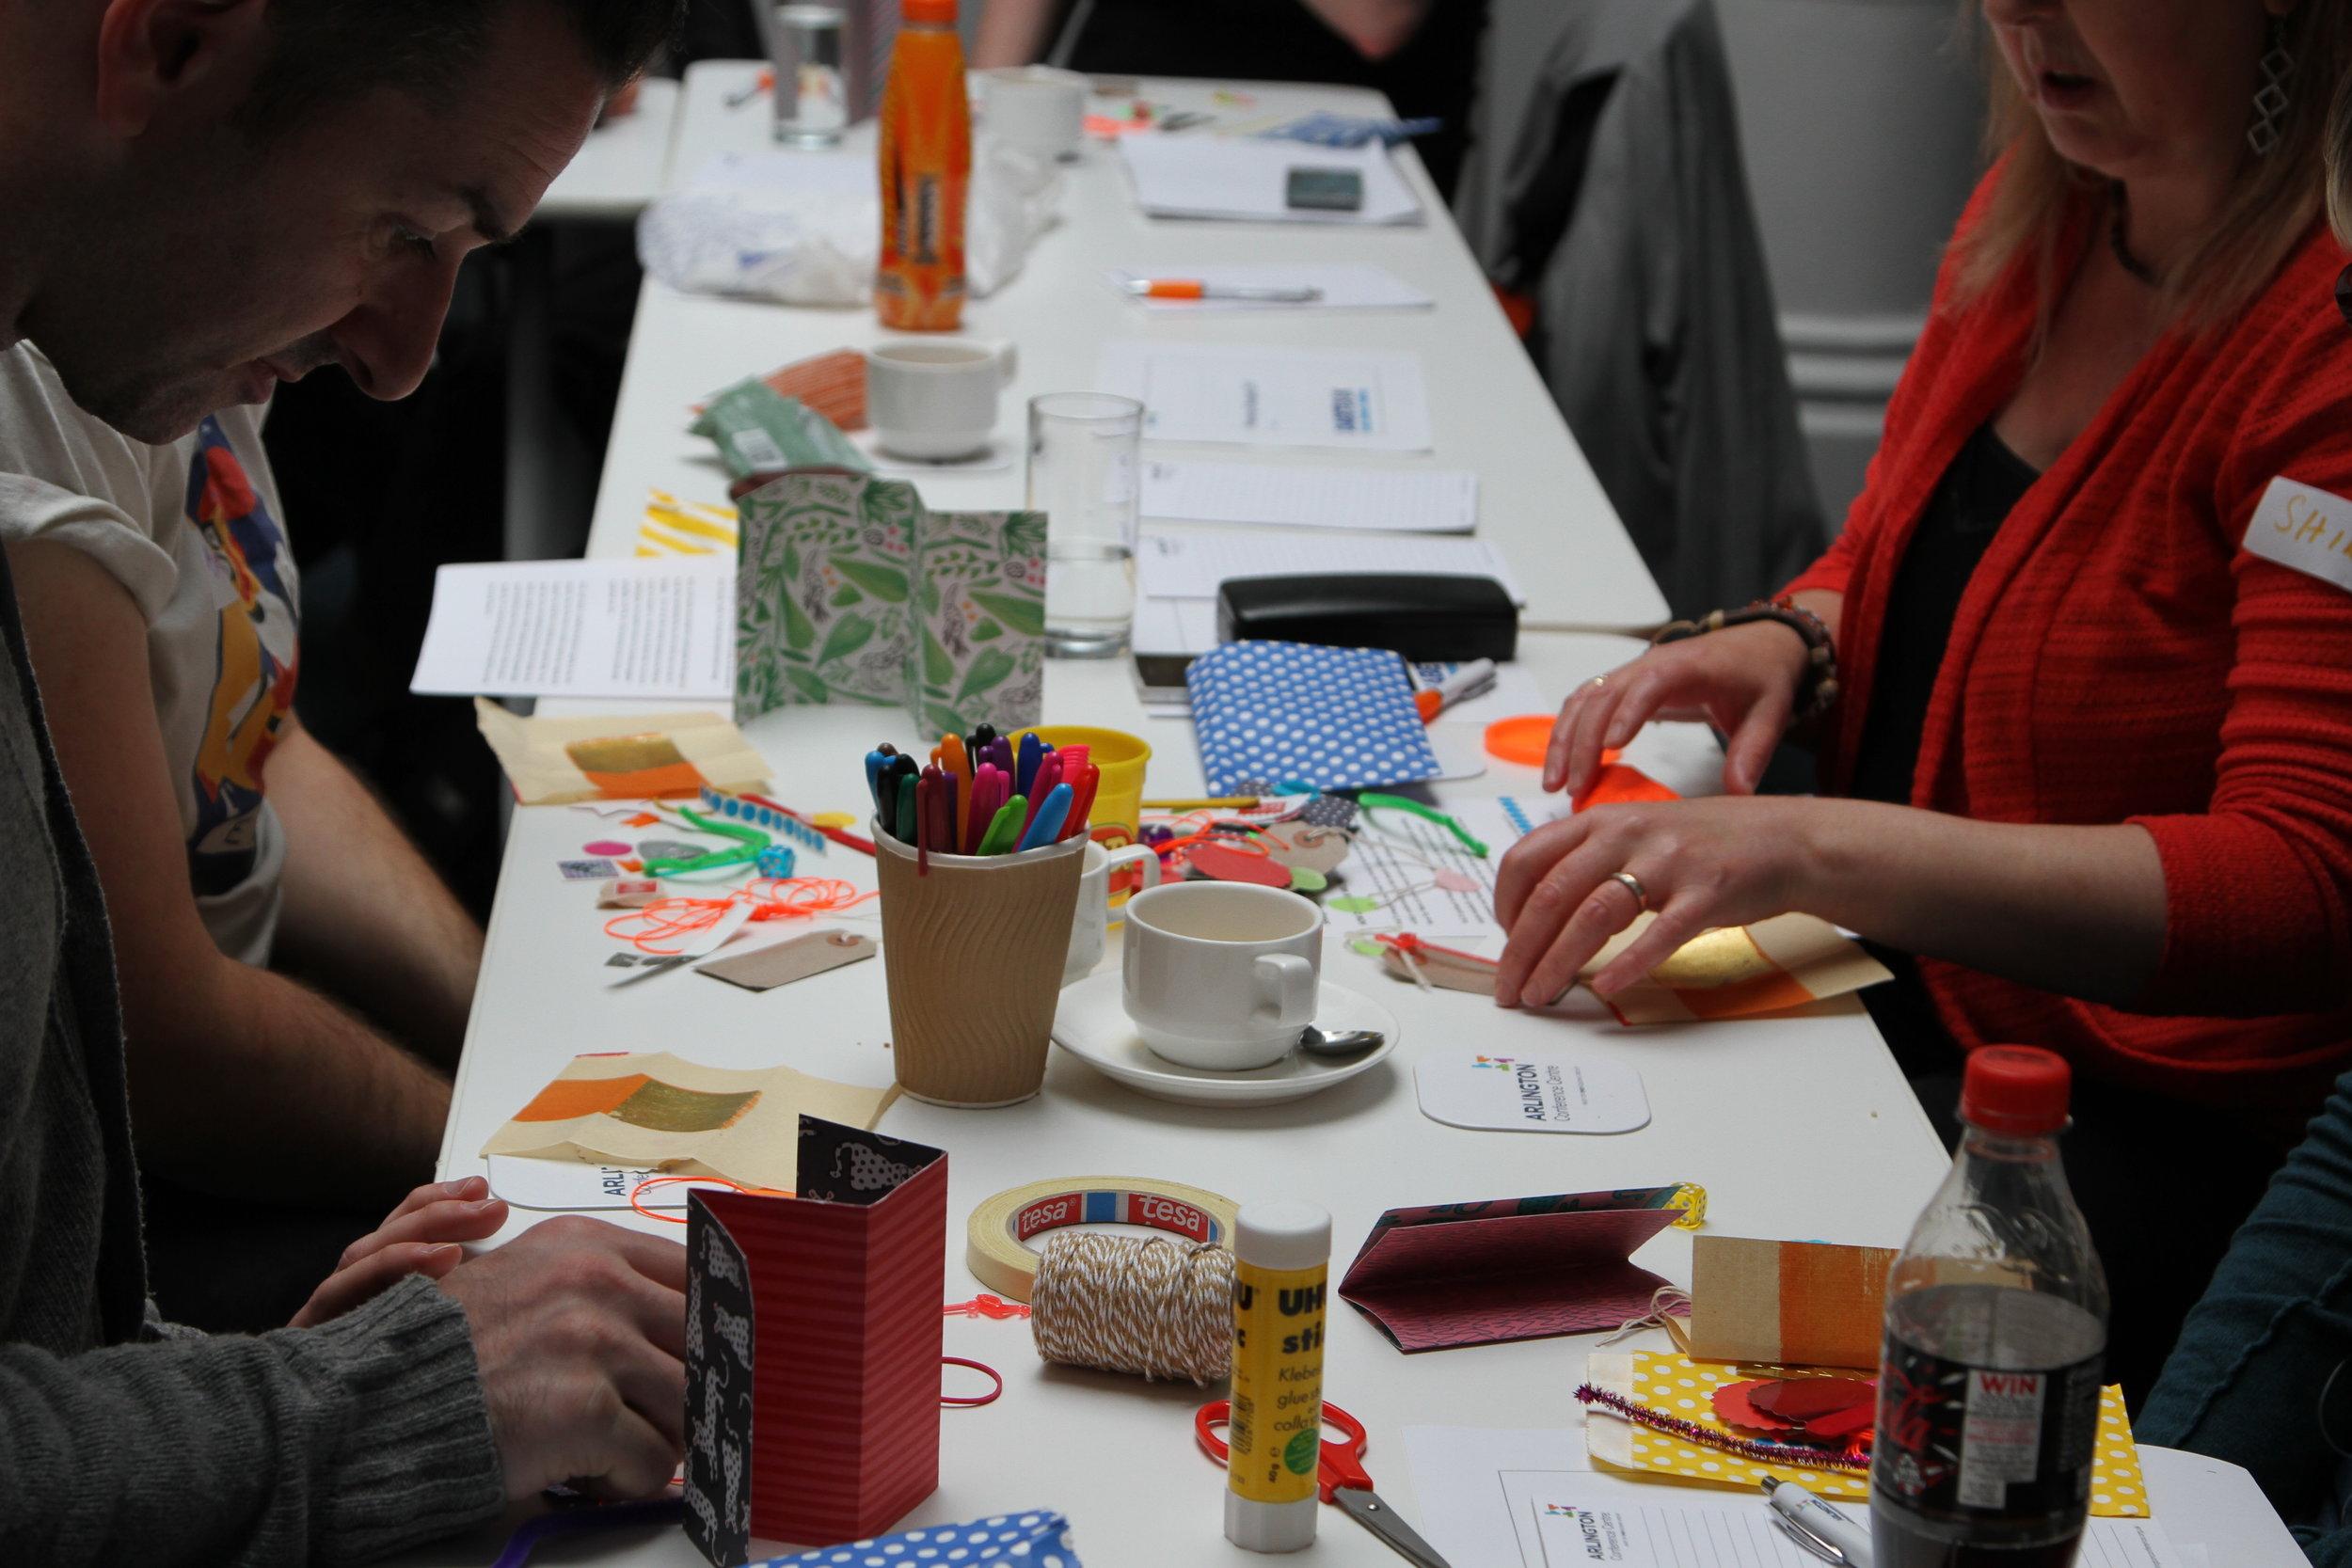 Open_To_Create..._Creative_Away-Days_Diabetes_UK_DM_SMT_creative_thinking_boosting_Anna_B_Sexton_Bag_of_creative_surprises.JPG